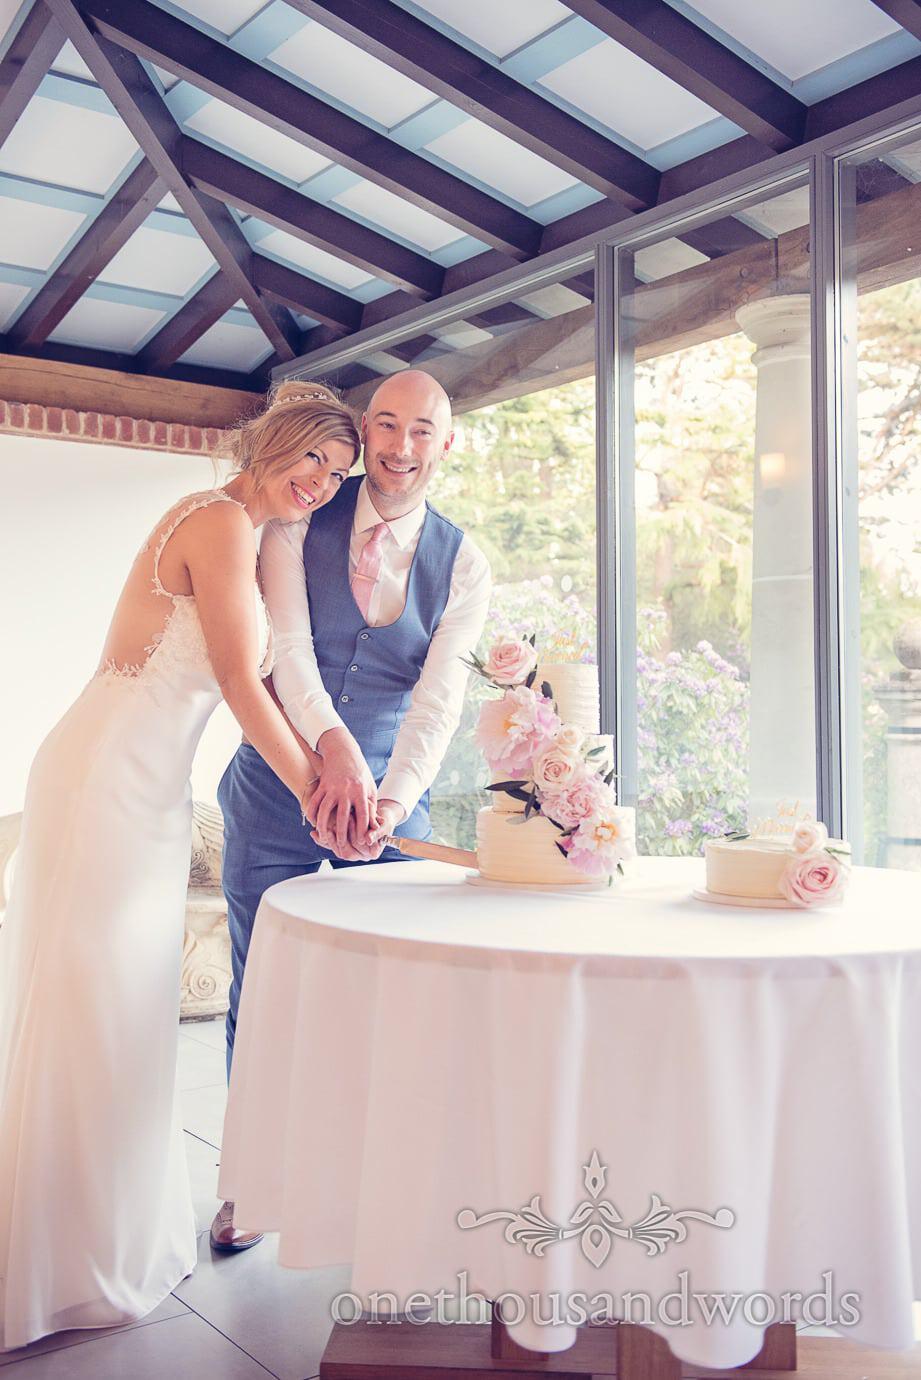 Cutting the cake at Italian Villa Wedding Photographs